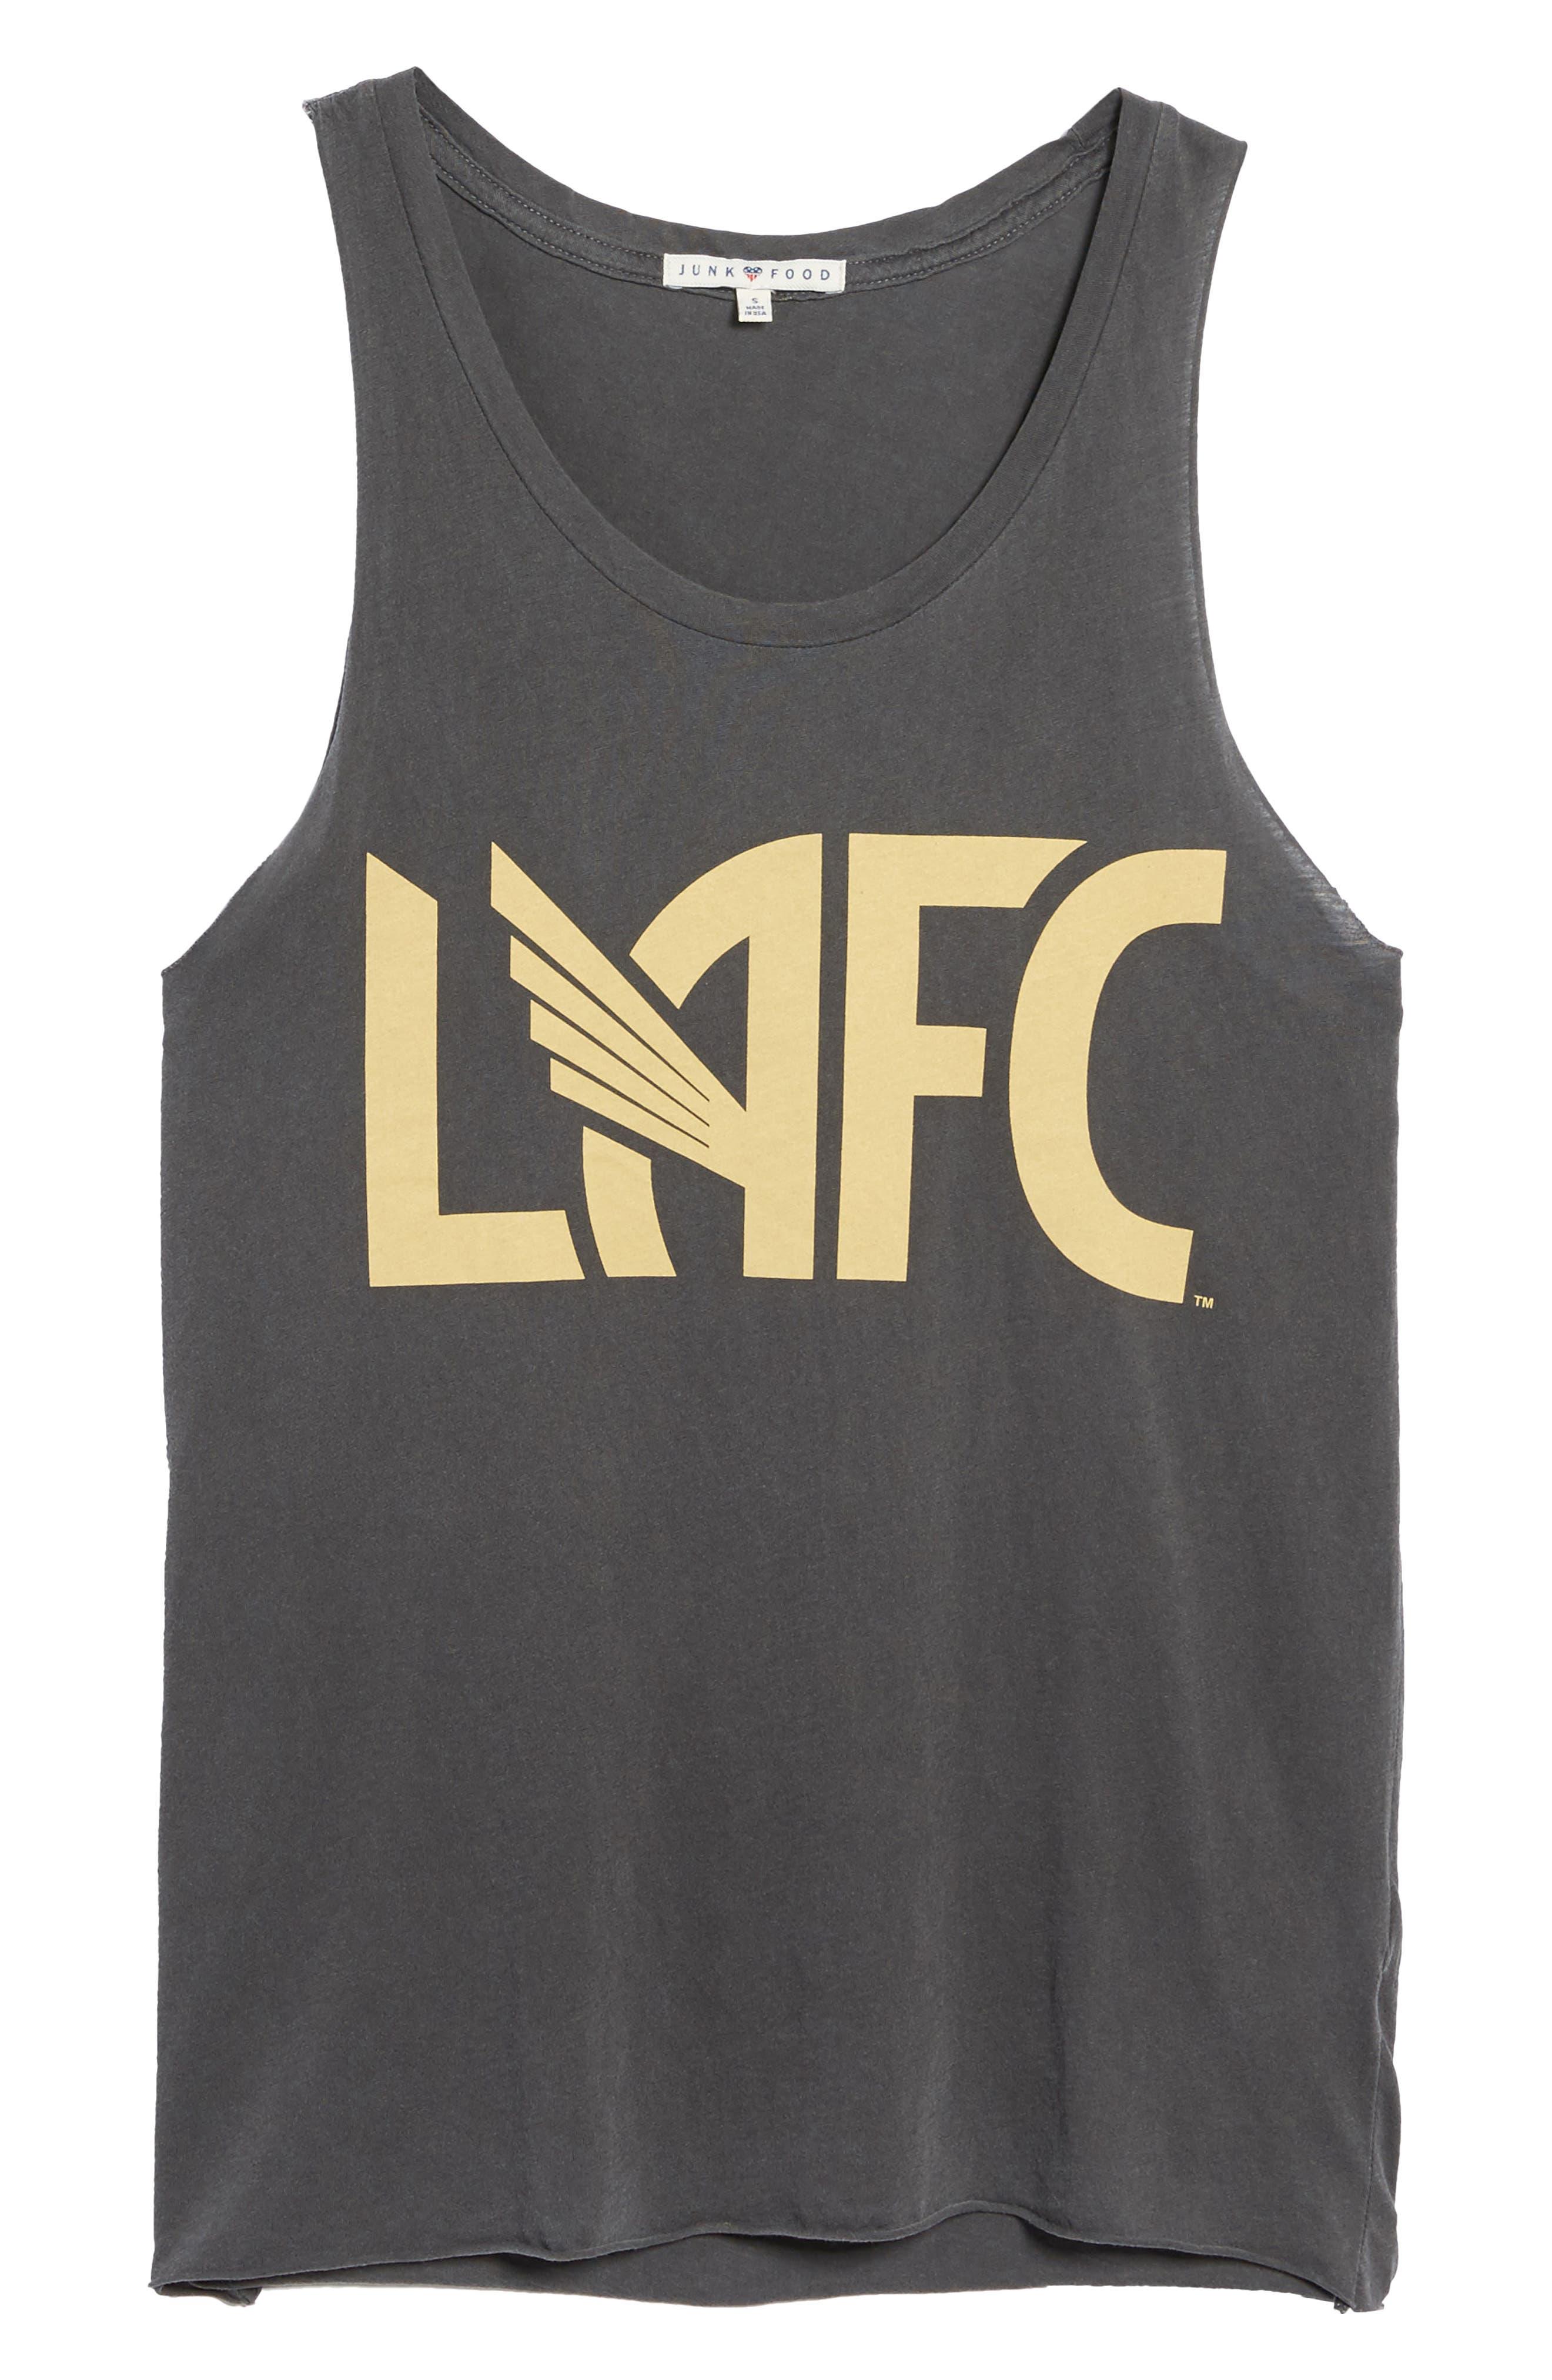 Los Angeles FC Tank,                             Alternate thumbnail 6, color,                             Jet Black